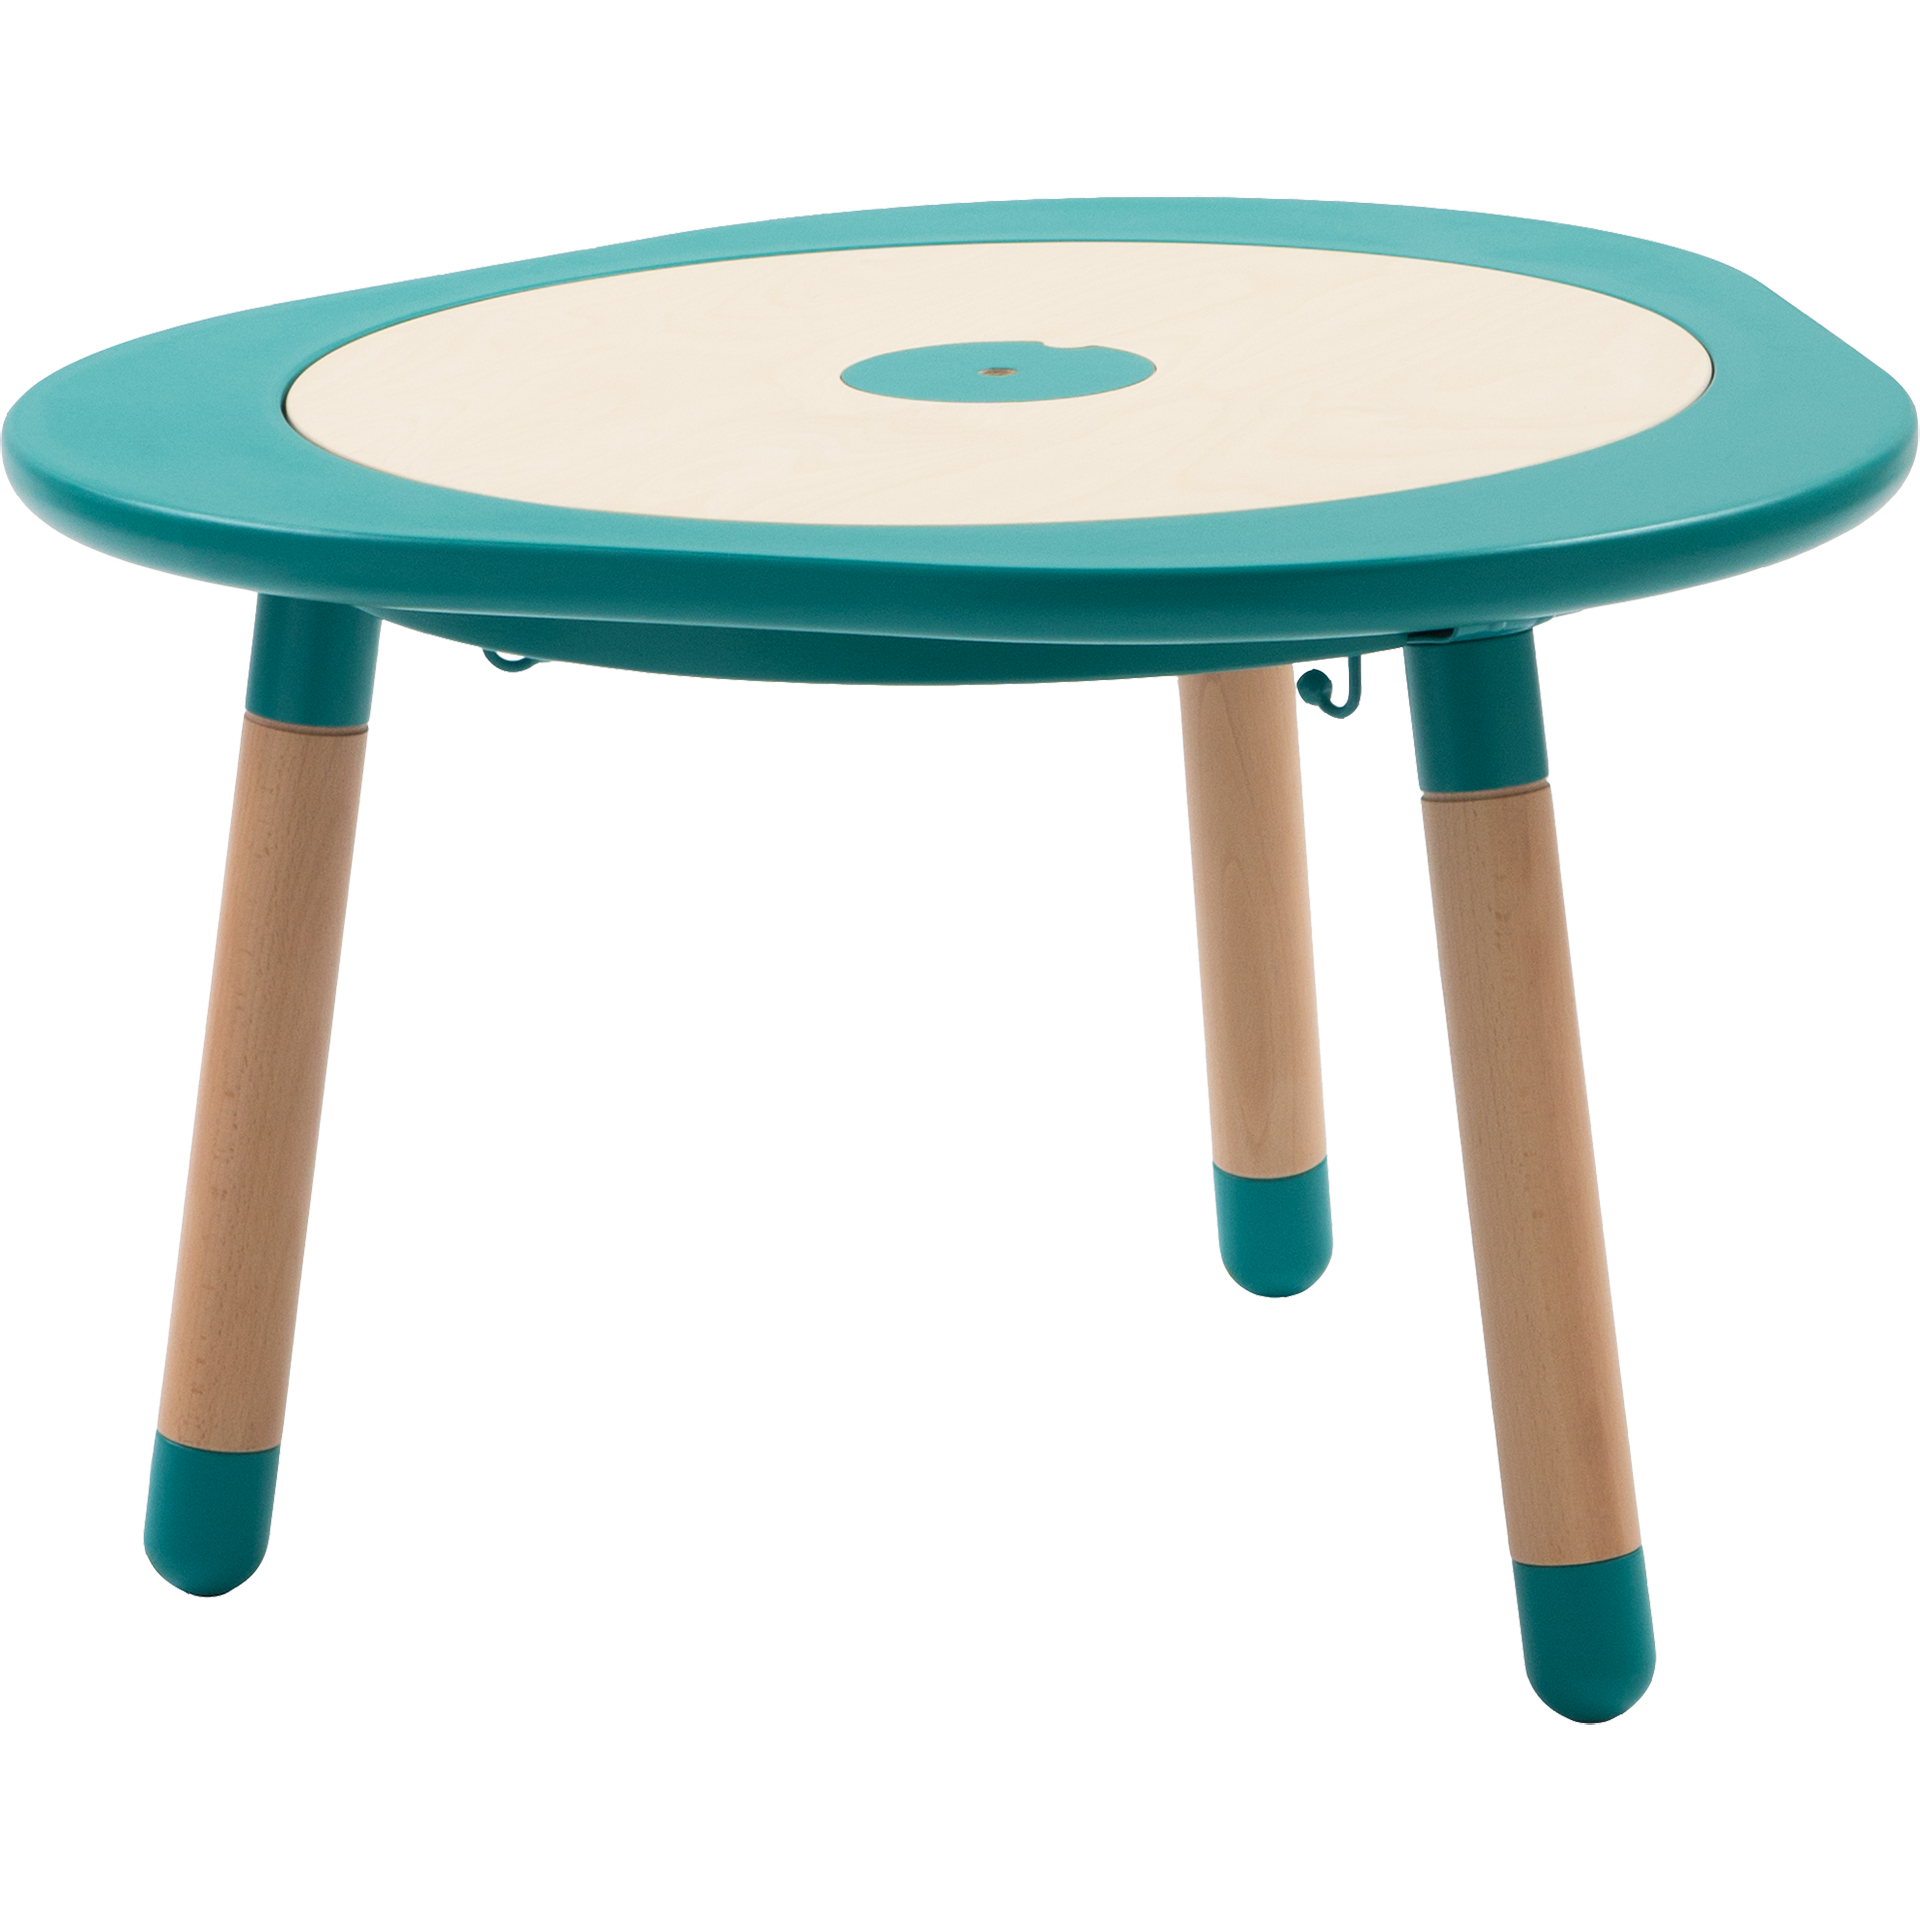 Playdough clipart table. Mutable toys the multi